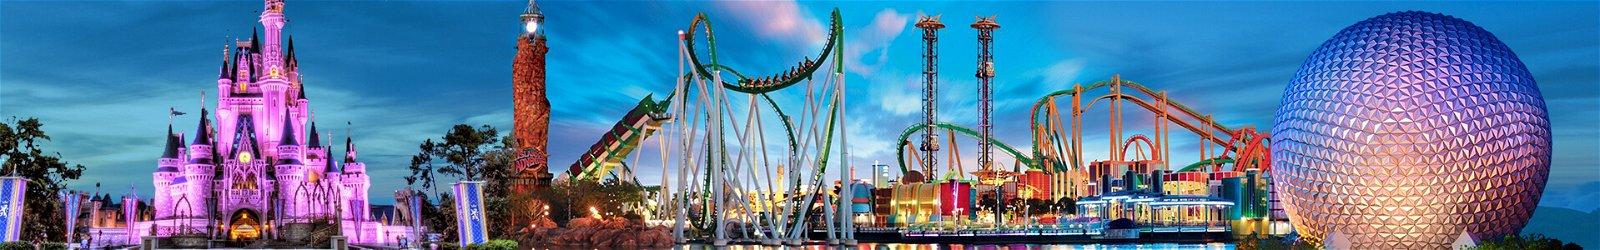 Viaje a Disney(Orlando) desde México 2020